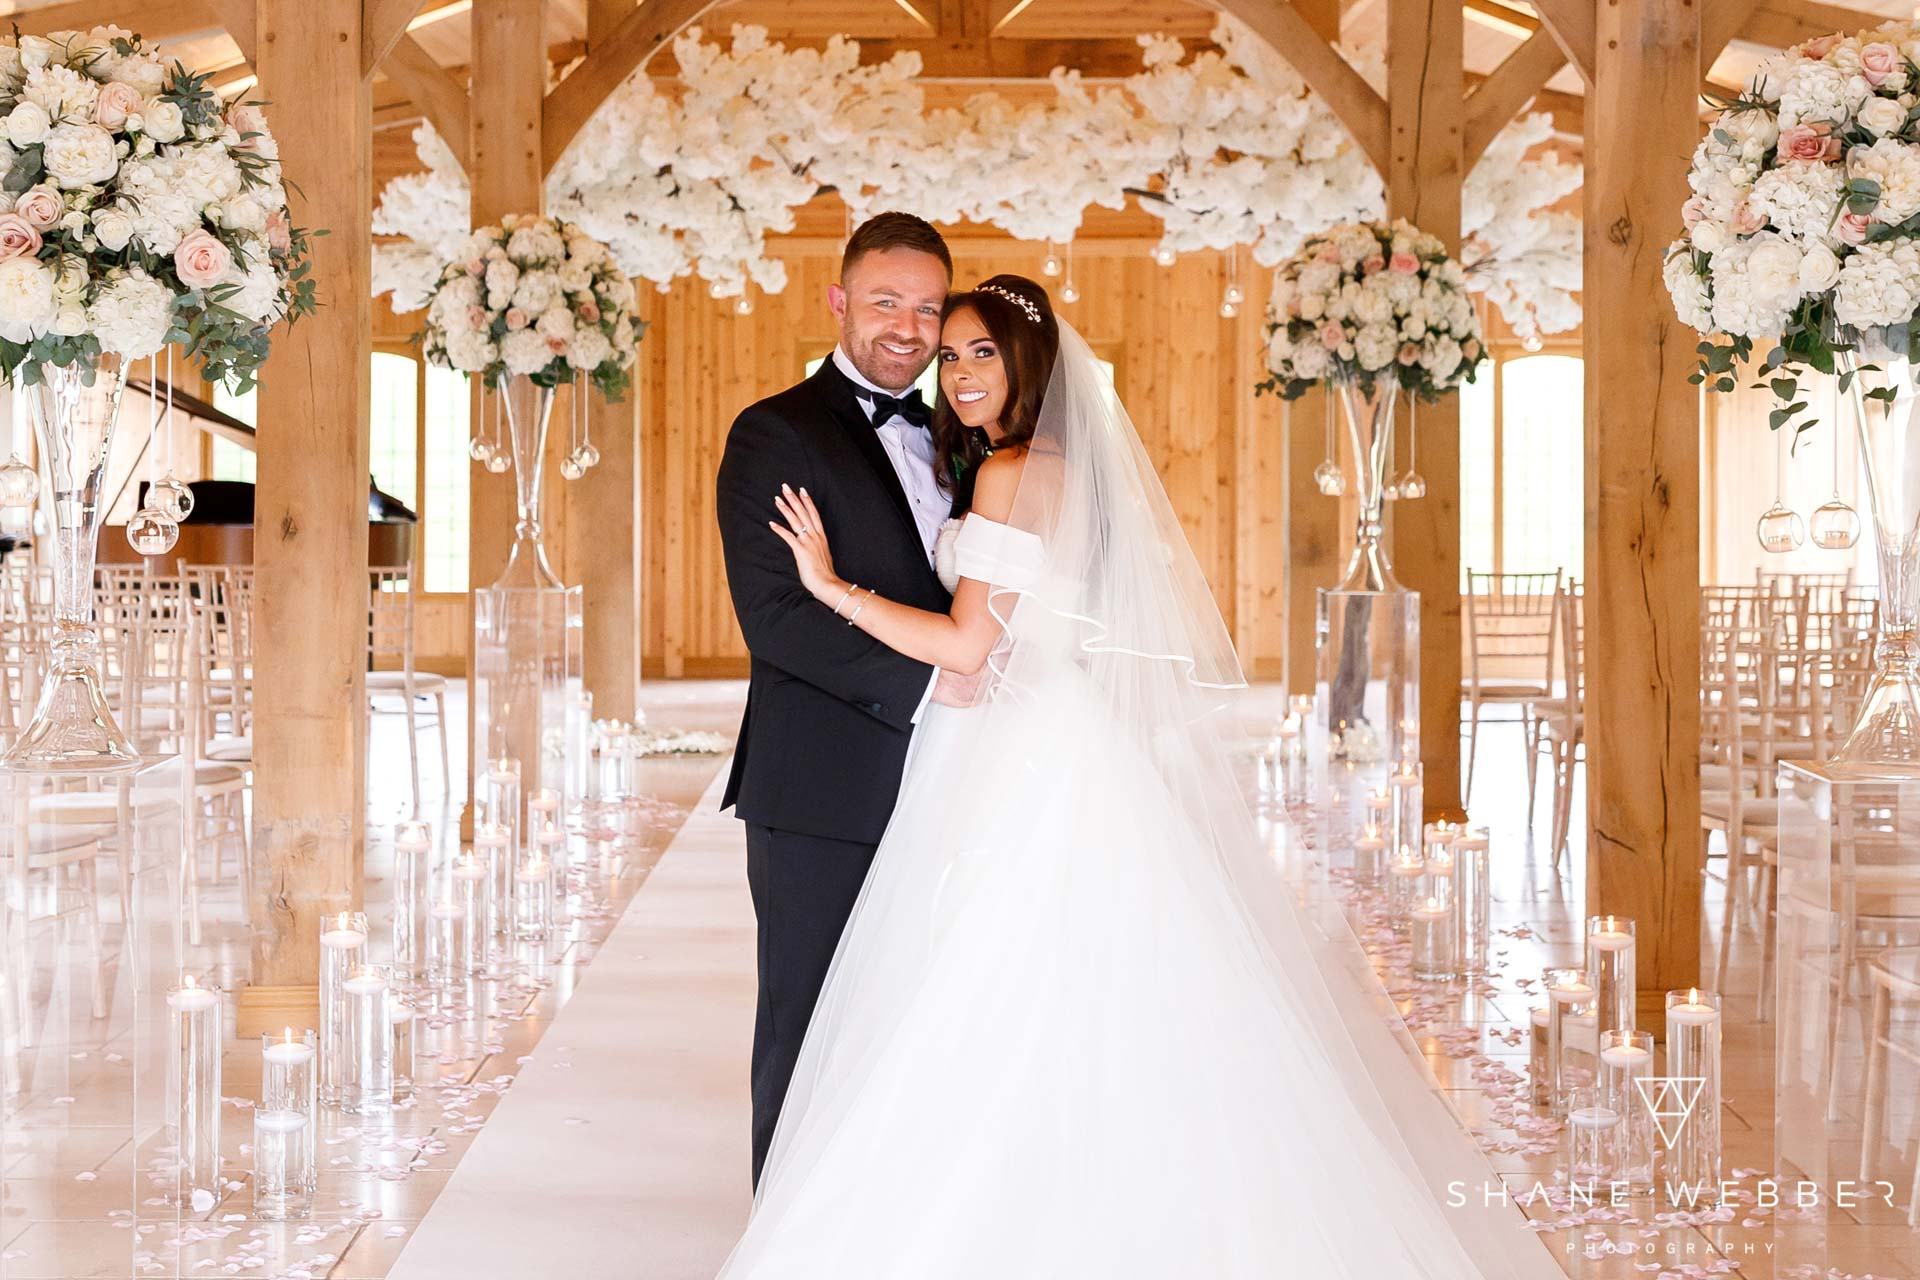 Best wedding planners in Cheshire